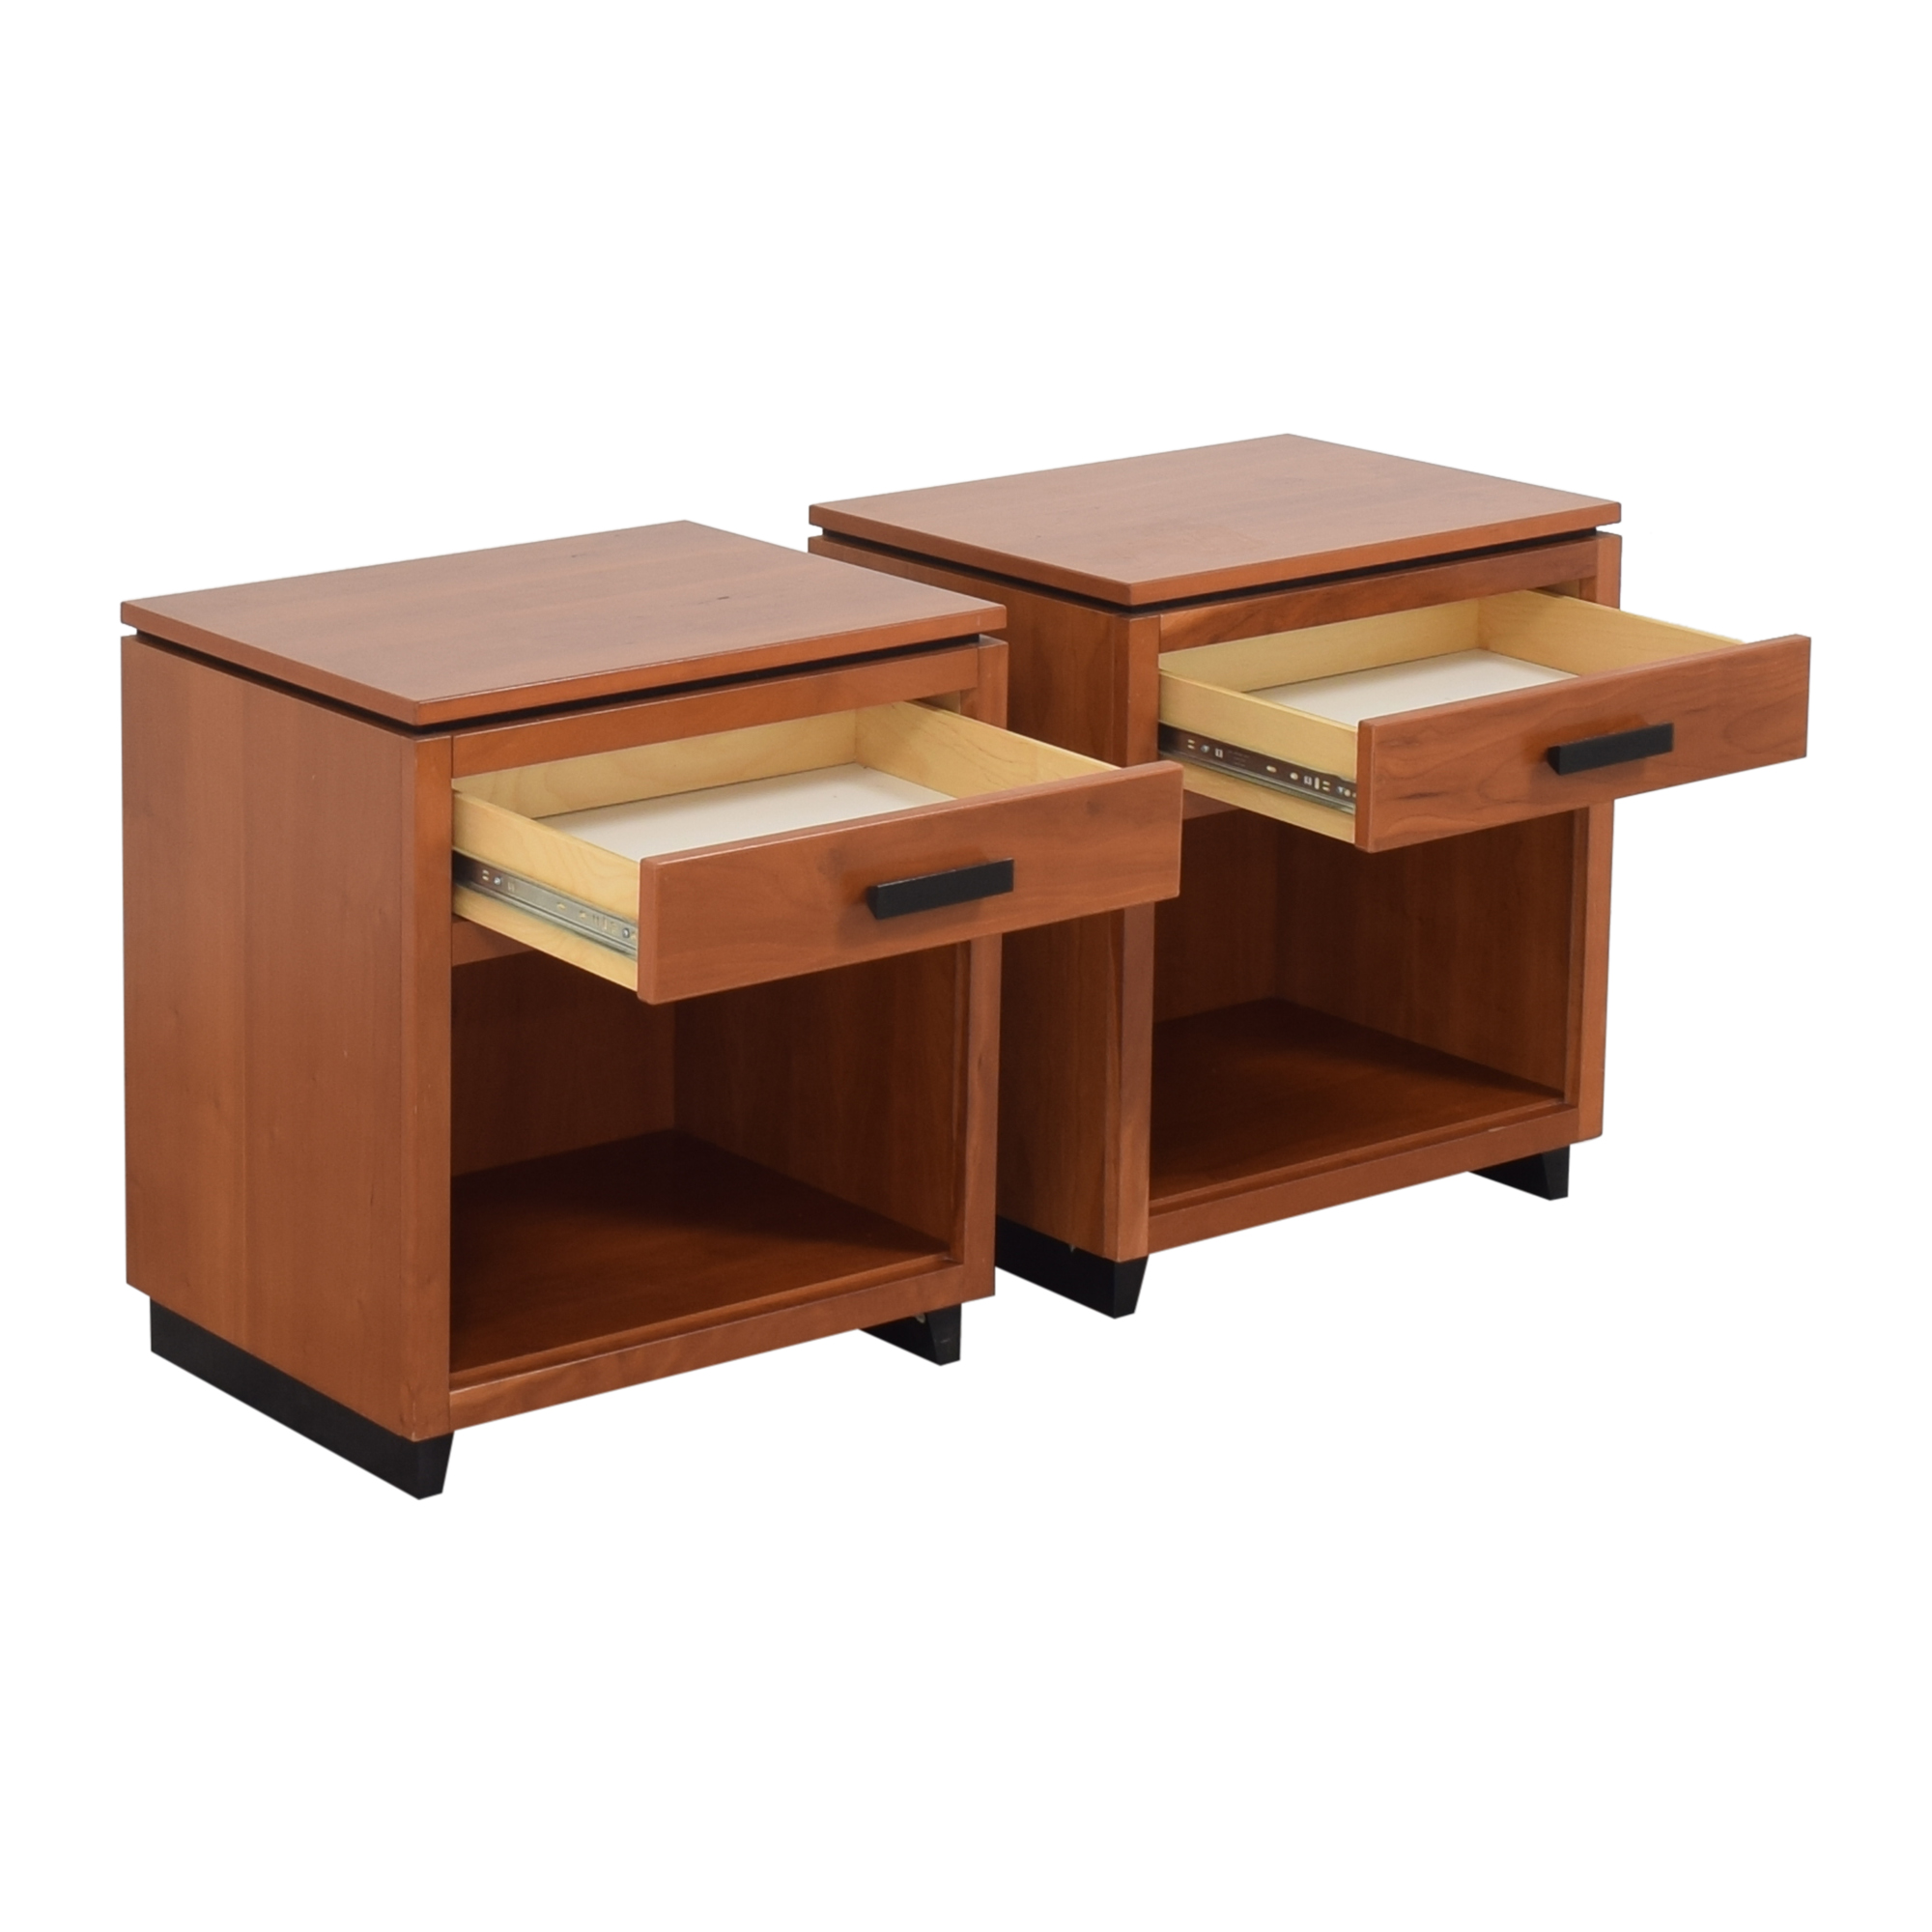 shop Workbench Workbench Single Drawer Nightstands online